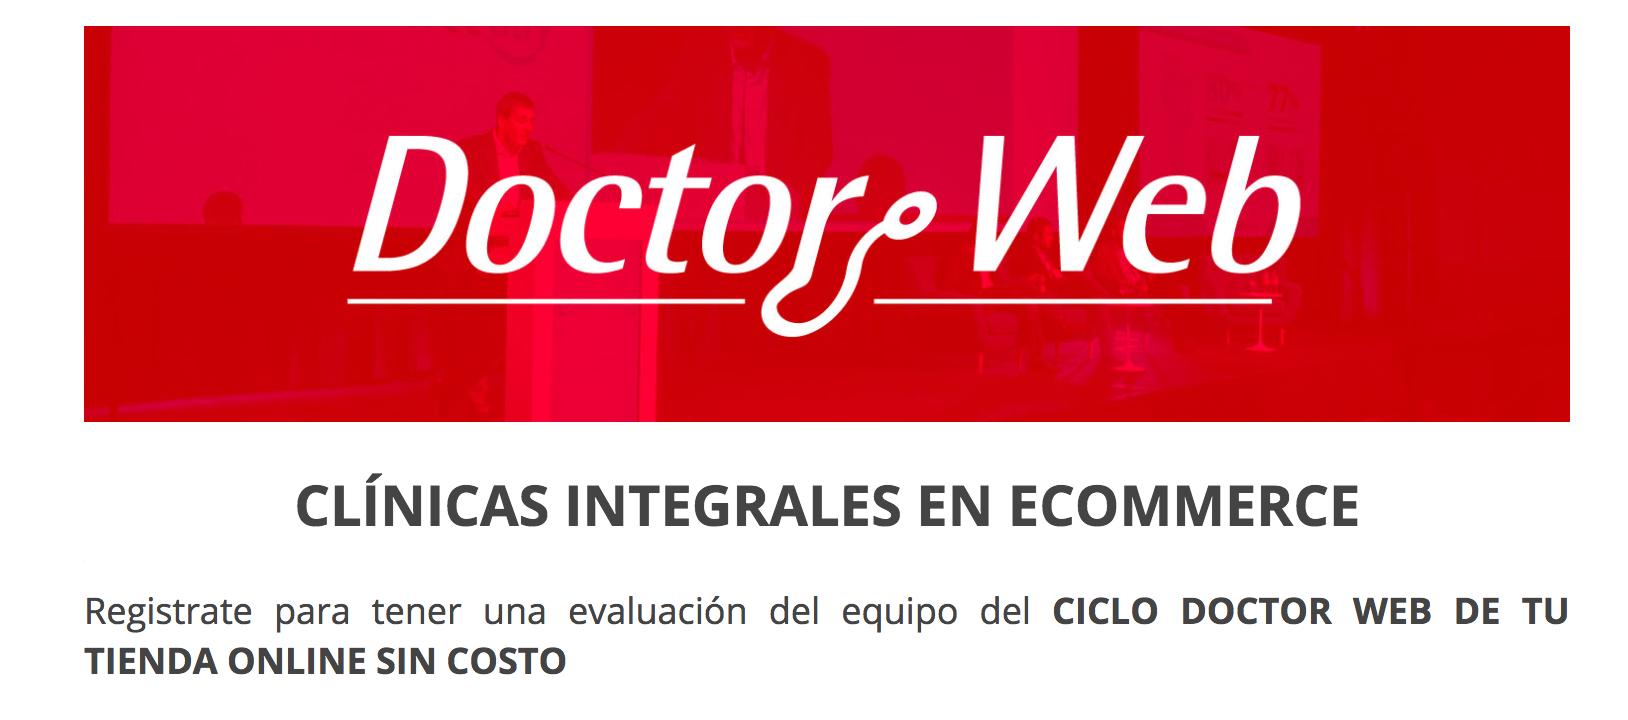 Clinicas Integrales para eCommerce Dr. Web